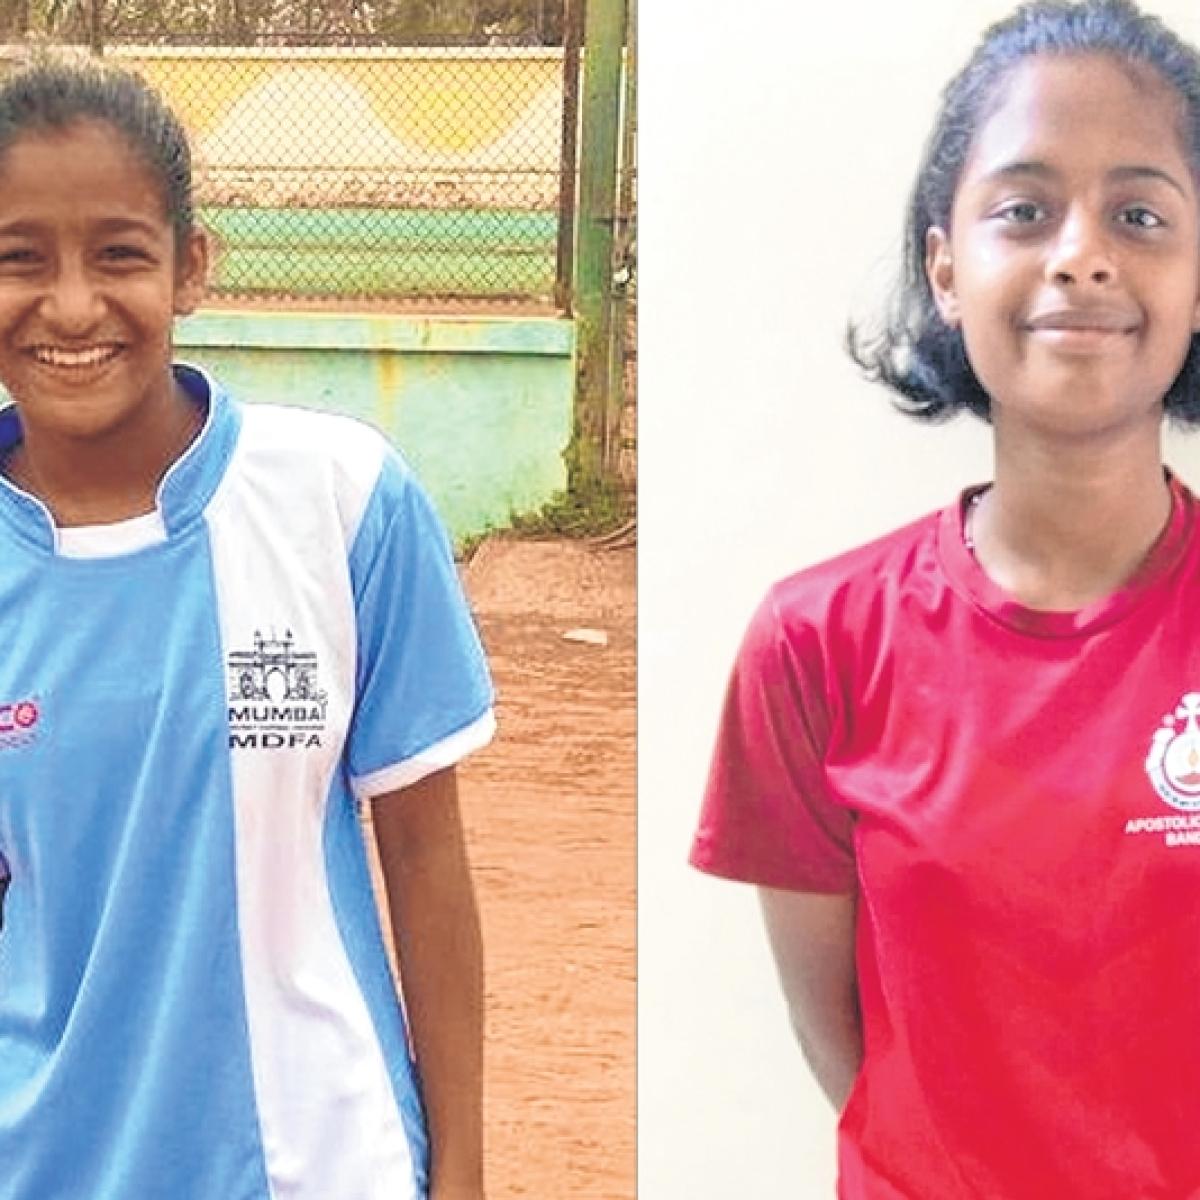 MSSA football: Glynelle Picardo and Riya D'sourza shine for Apostolic Carmel